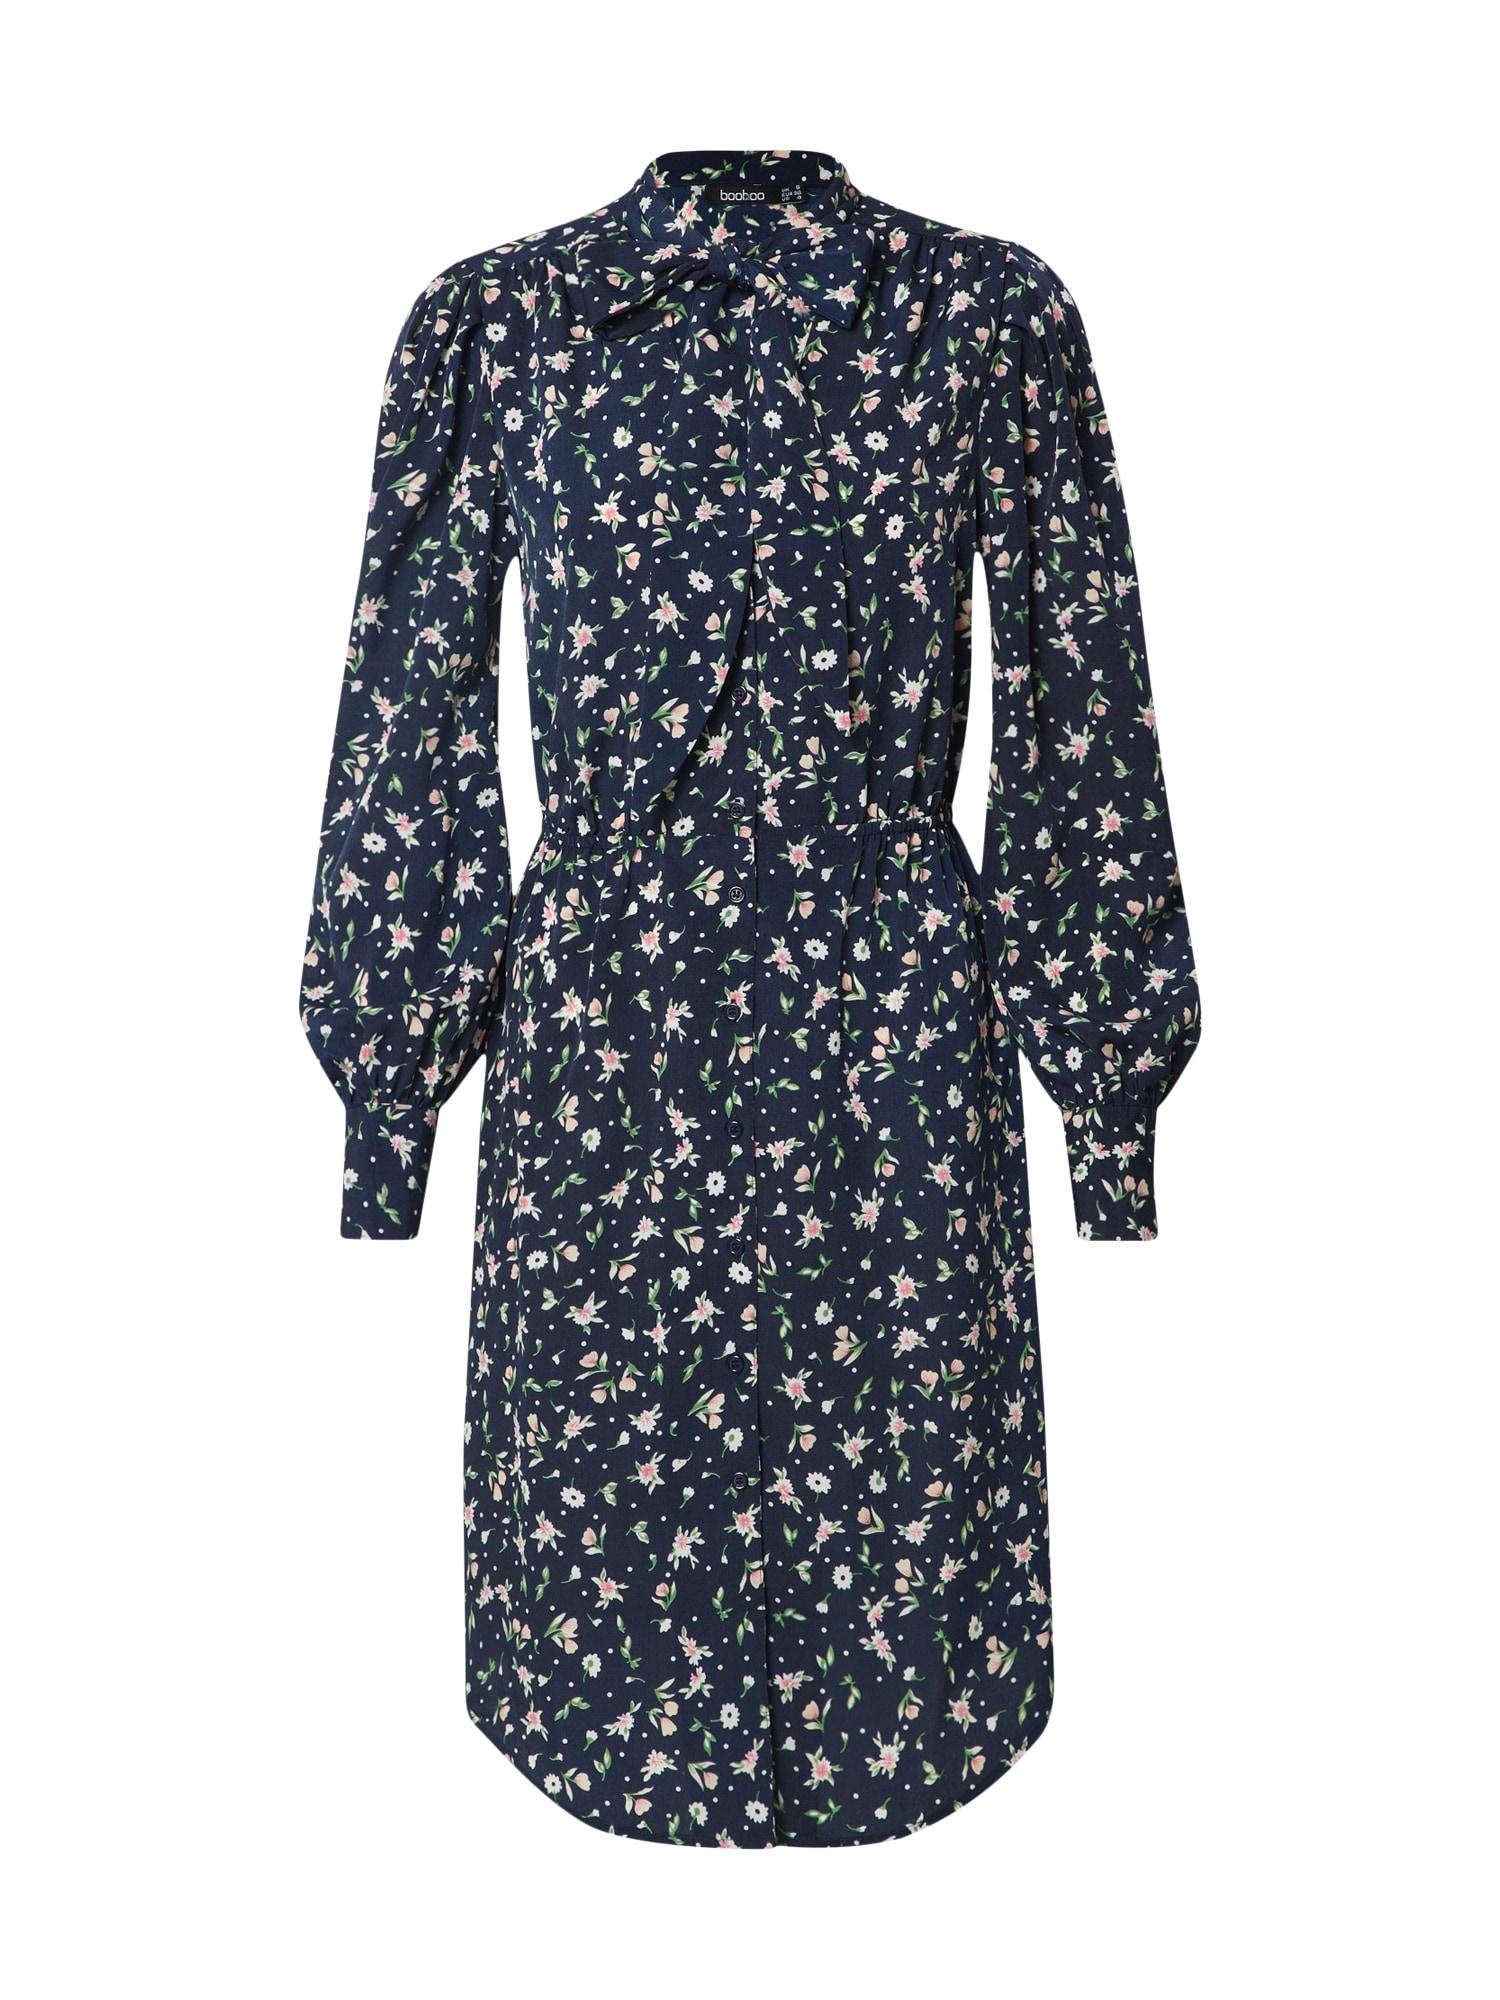 Boohoo Vasarinė suknelė 'Floral Button through Dress with Pussy Bow' tamsiai mėlyna